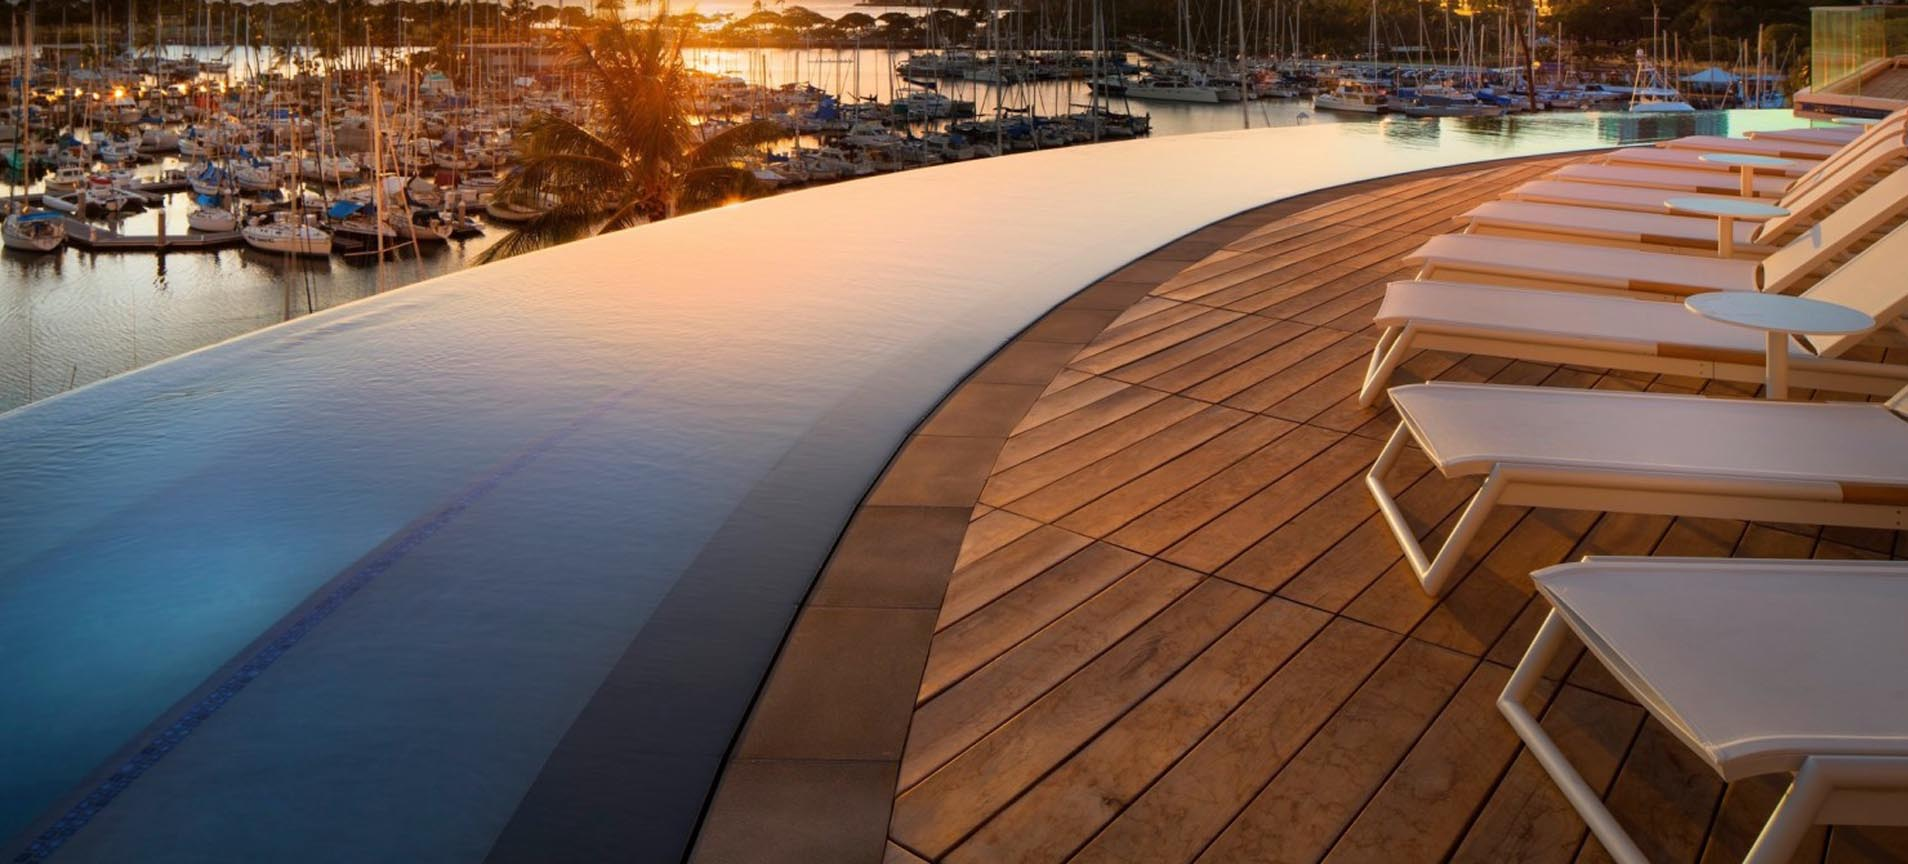 Flagstone Hardscape Alternatives: IPE Wood Deck Tiles & Concrete Pavers